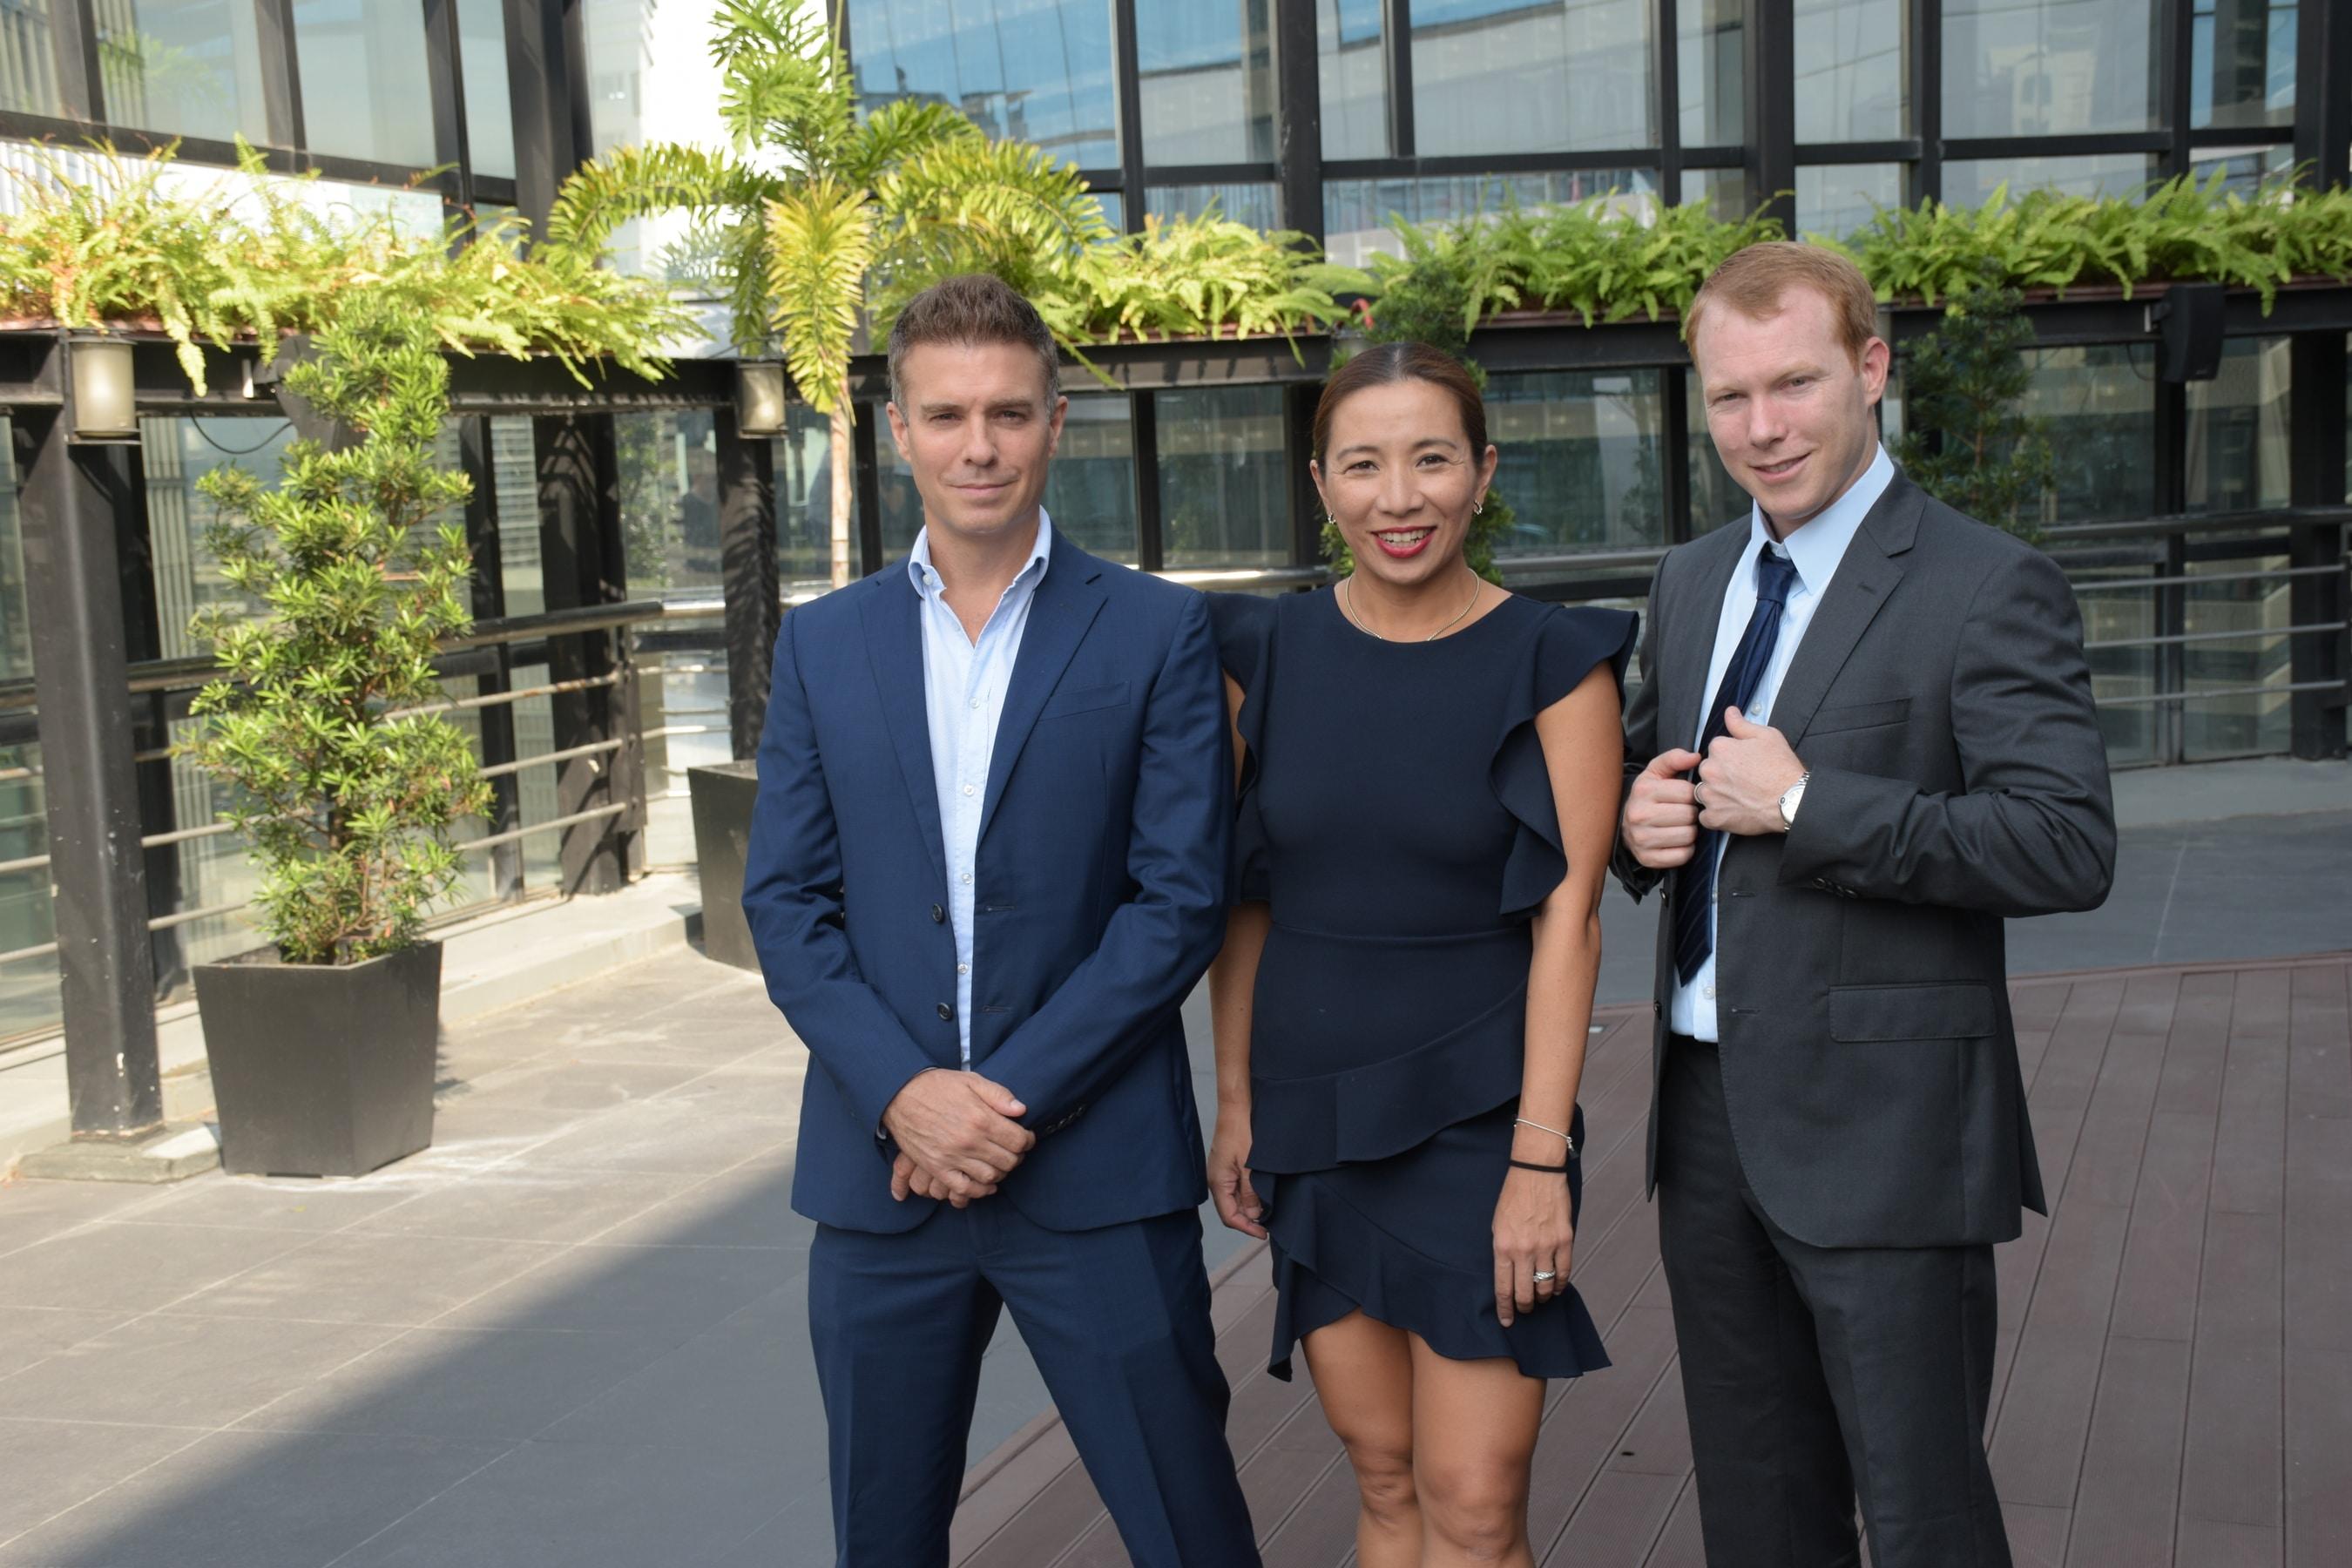 KMC Executives (Gregory Kittelson, Amanda Carpo, and Michael McCullough